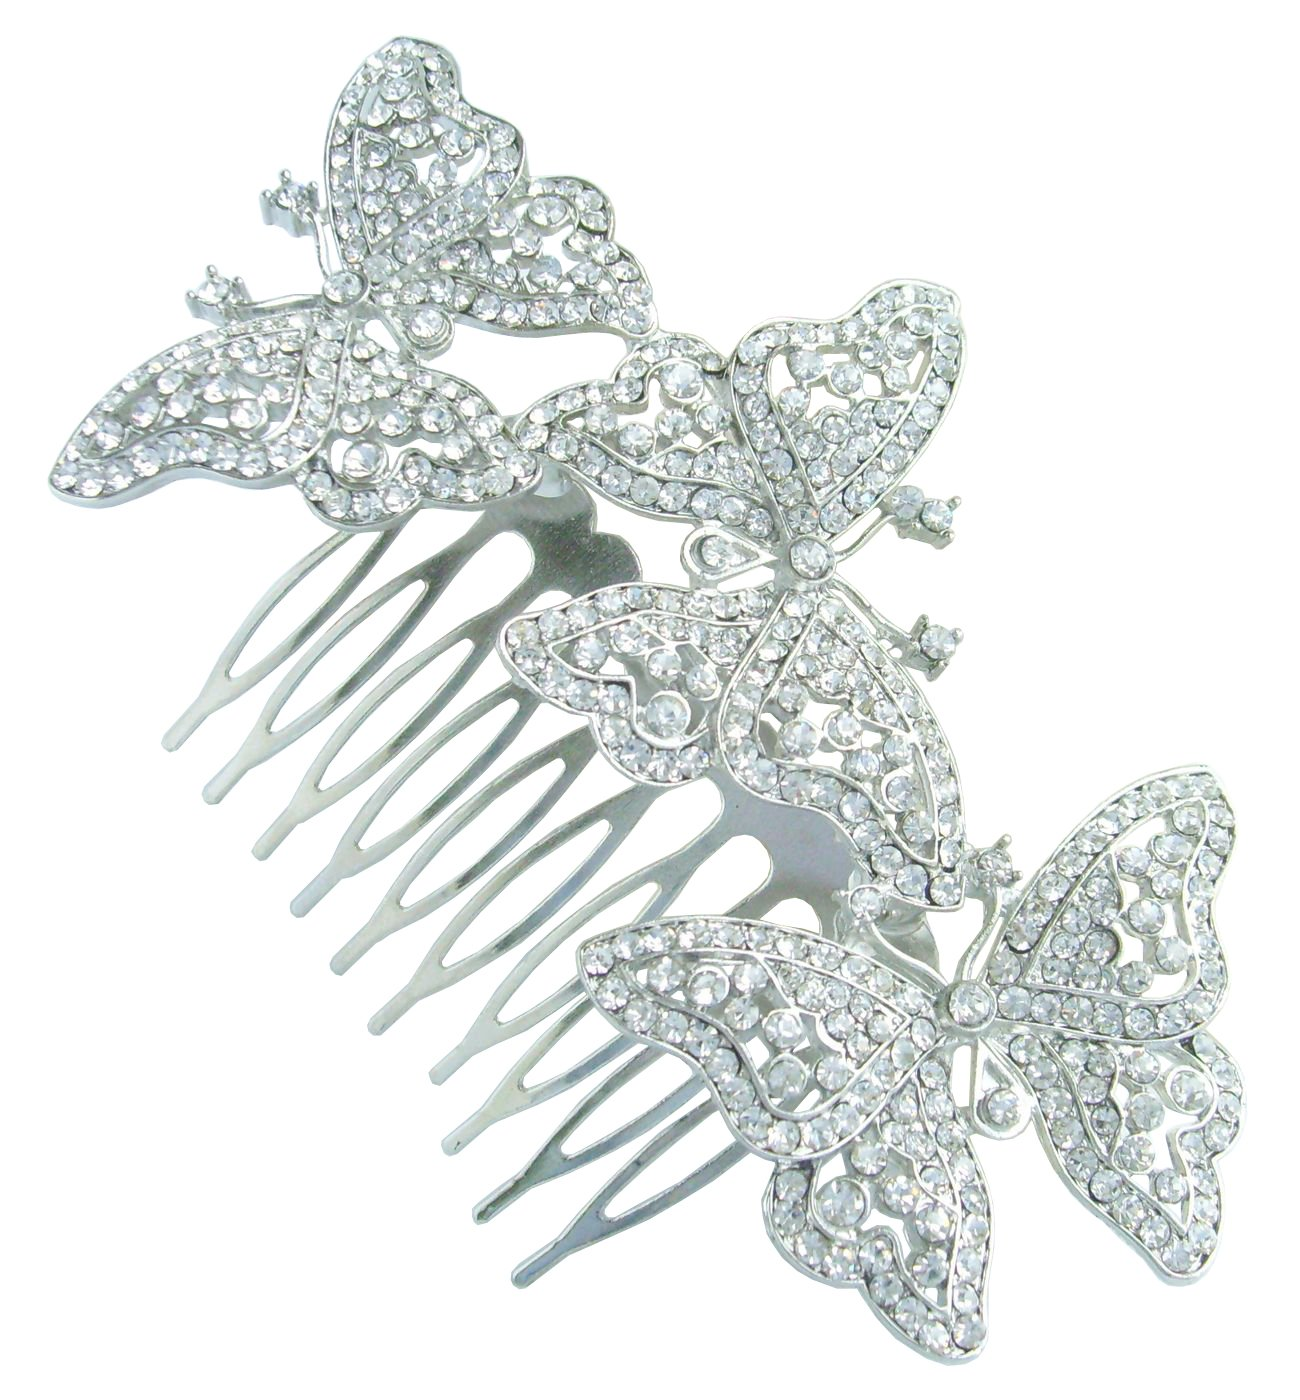 Sindary 4.13'' Silver Tone Clear Rhinestone Crystal Butterfly Bridal Hair Comb Wedding Headpiece HZ2859